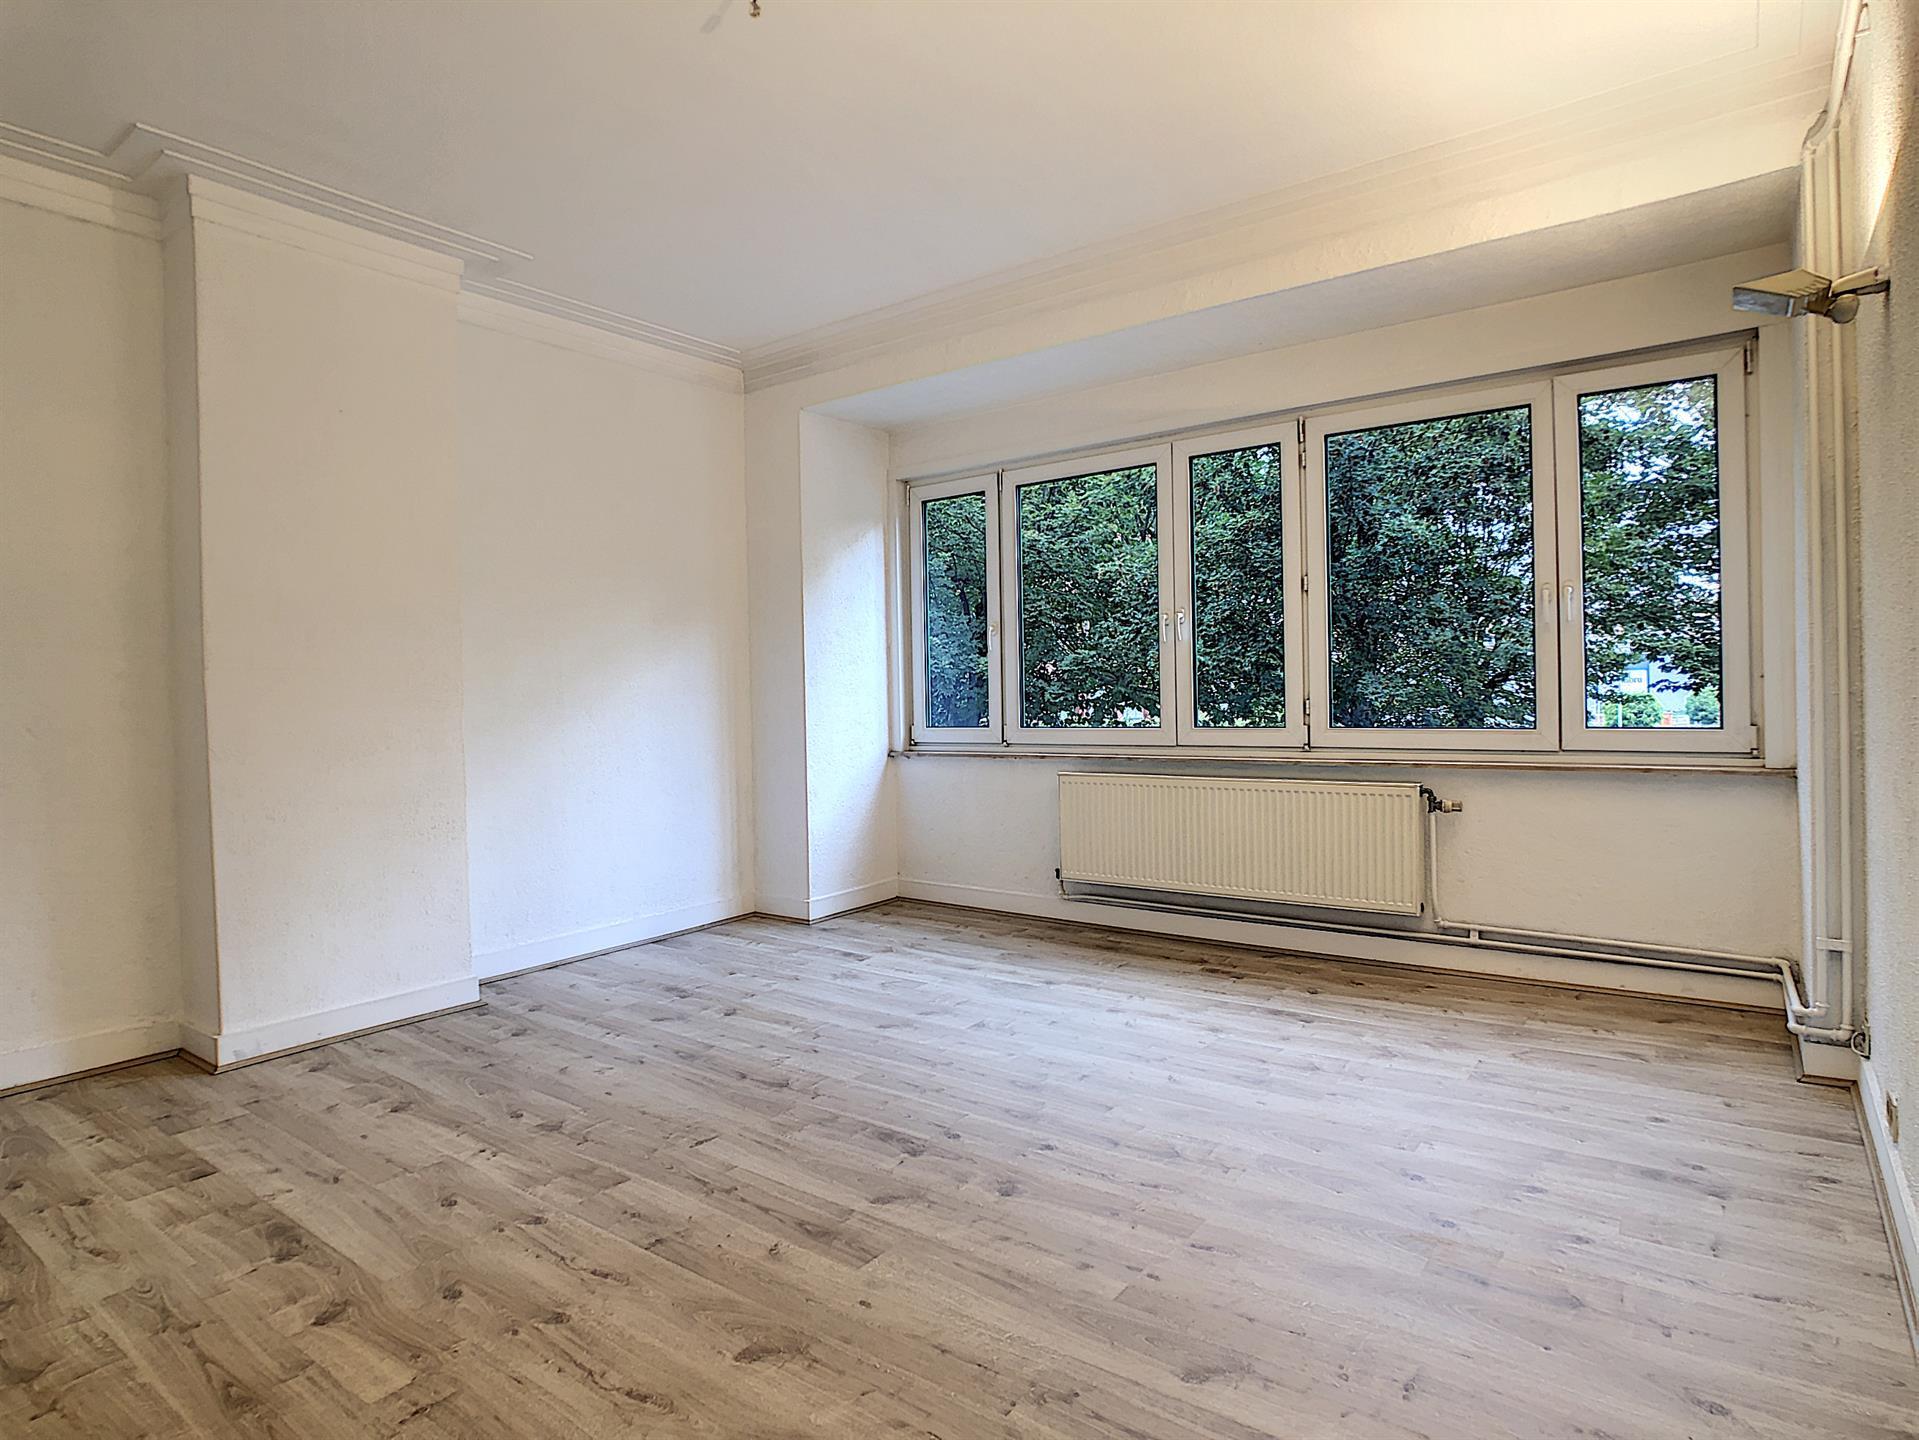 Appartement - Anderlecht - #4130920-2